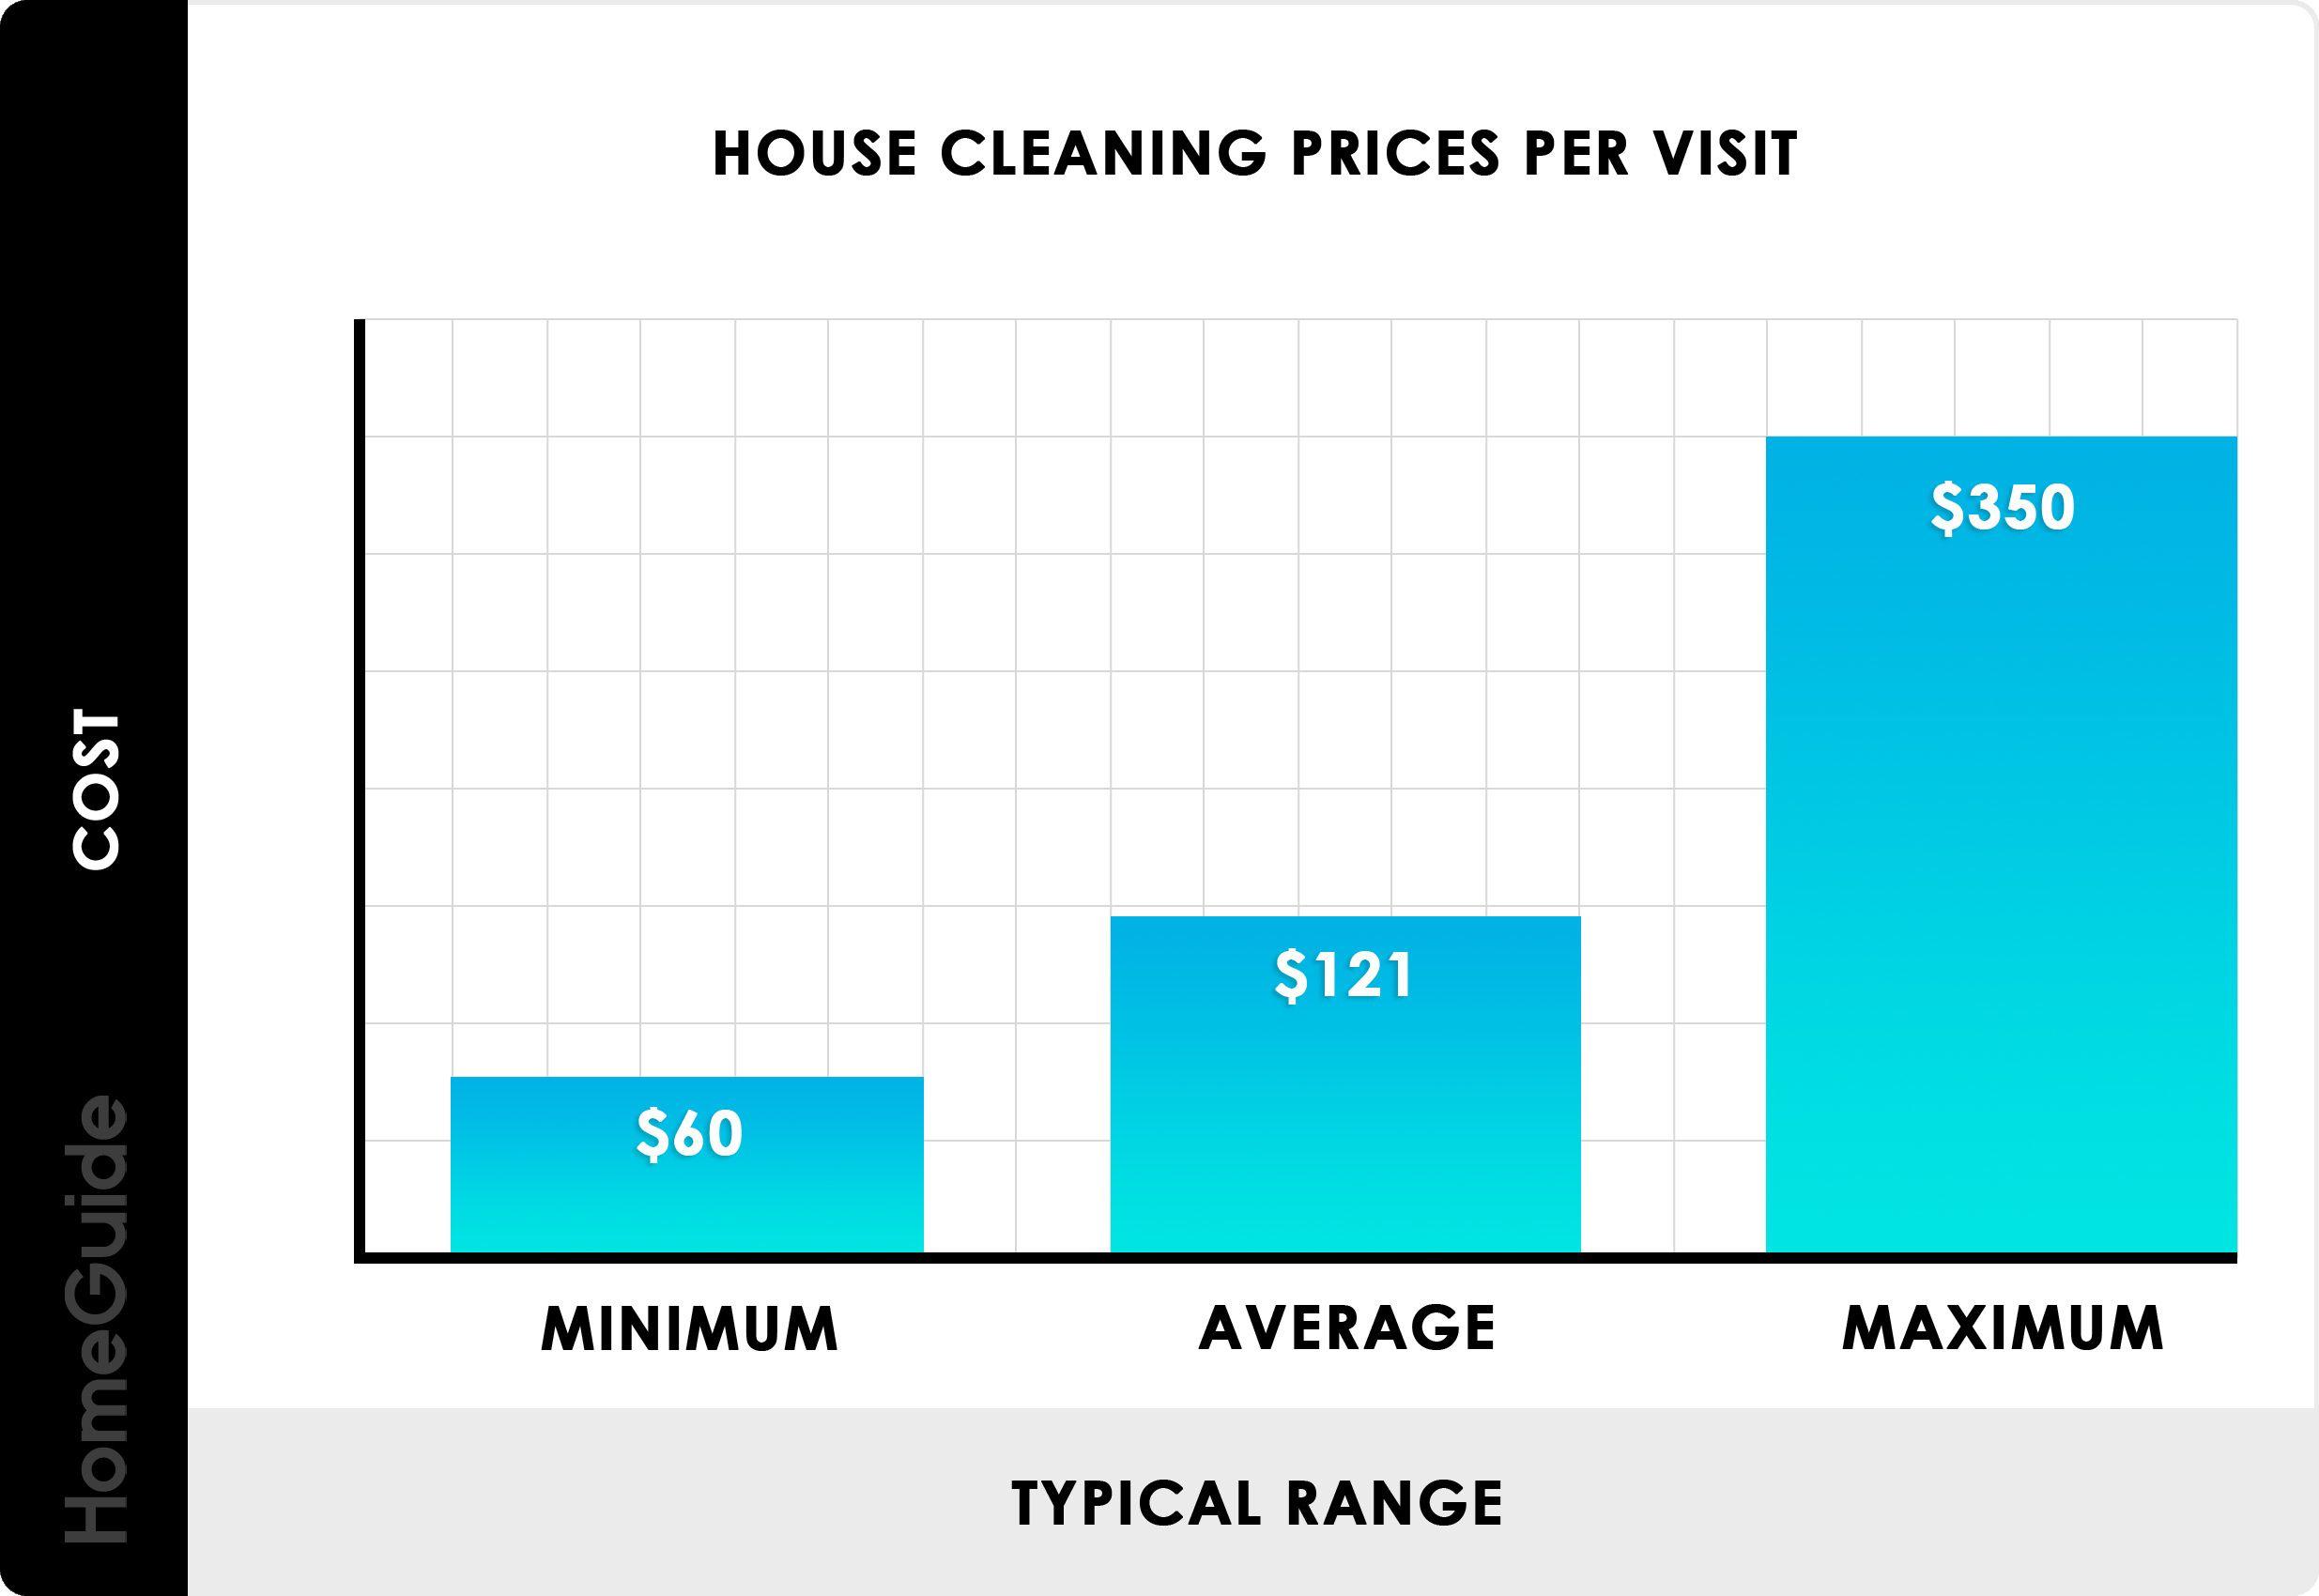 Carpet Cleaning Estimate Calculator In 2020 House Cleaning Prices Clean House House Cleaning Services